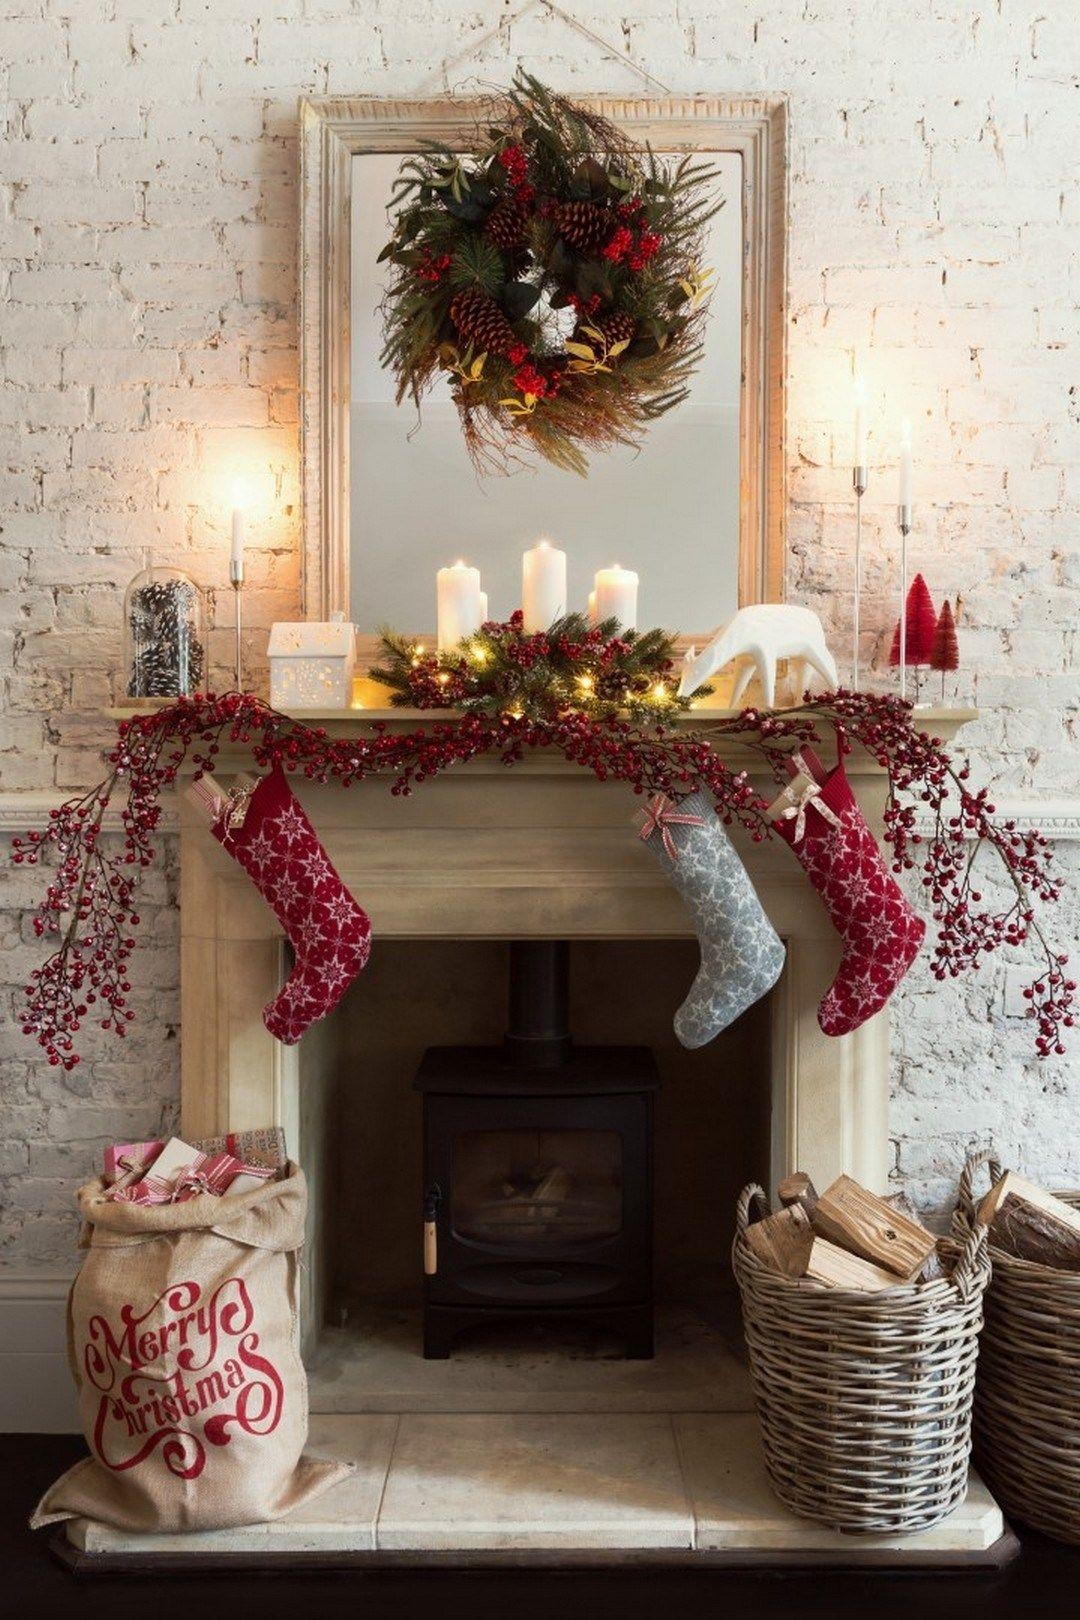 Beautiful Contemporary Hygge Christmas Decorations 1 Christmas Fireplace Christmas Fireplace Decor Christmas Mantel Garland